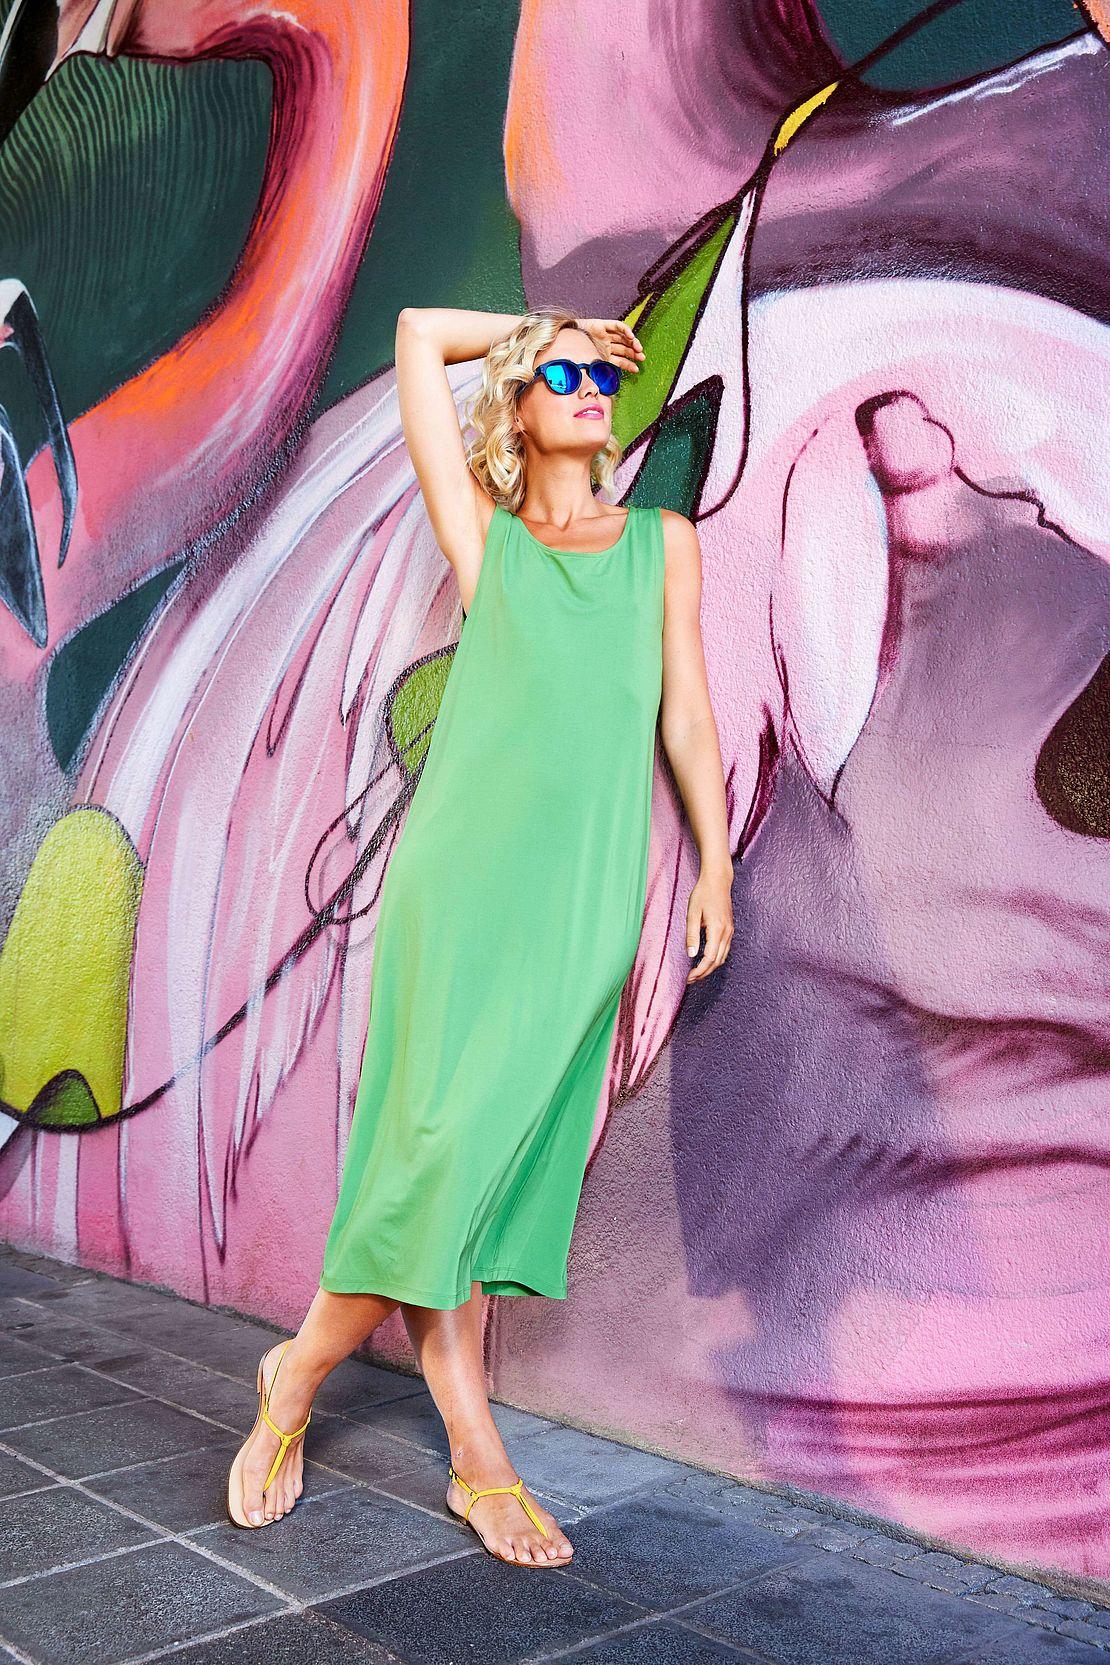 Frau mit Panto Sonnenbrille Modell 3021159